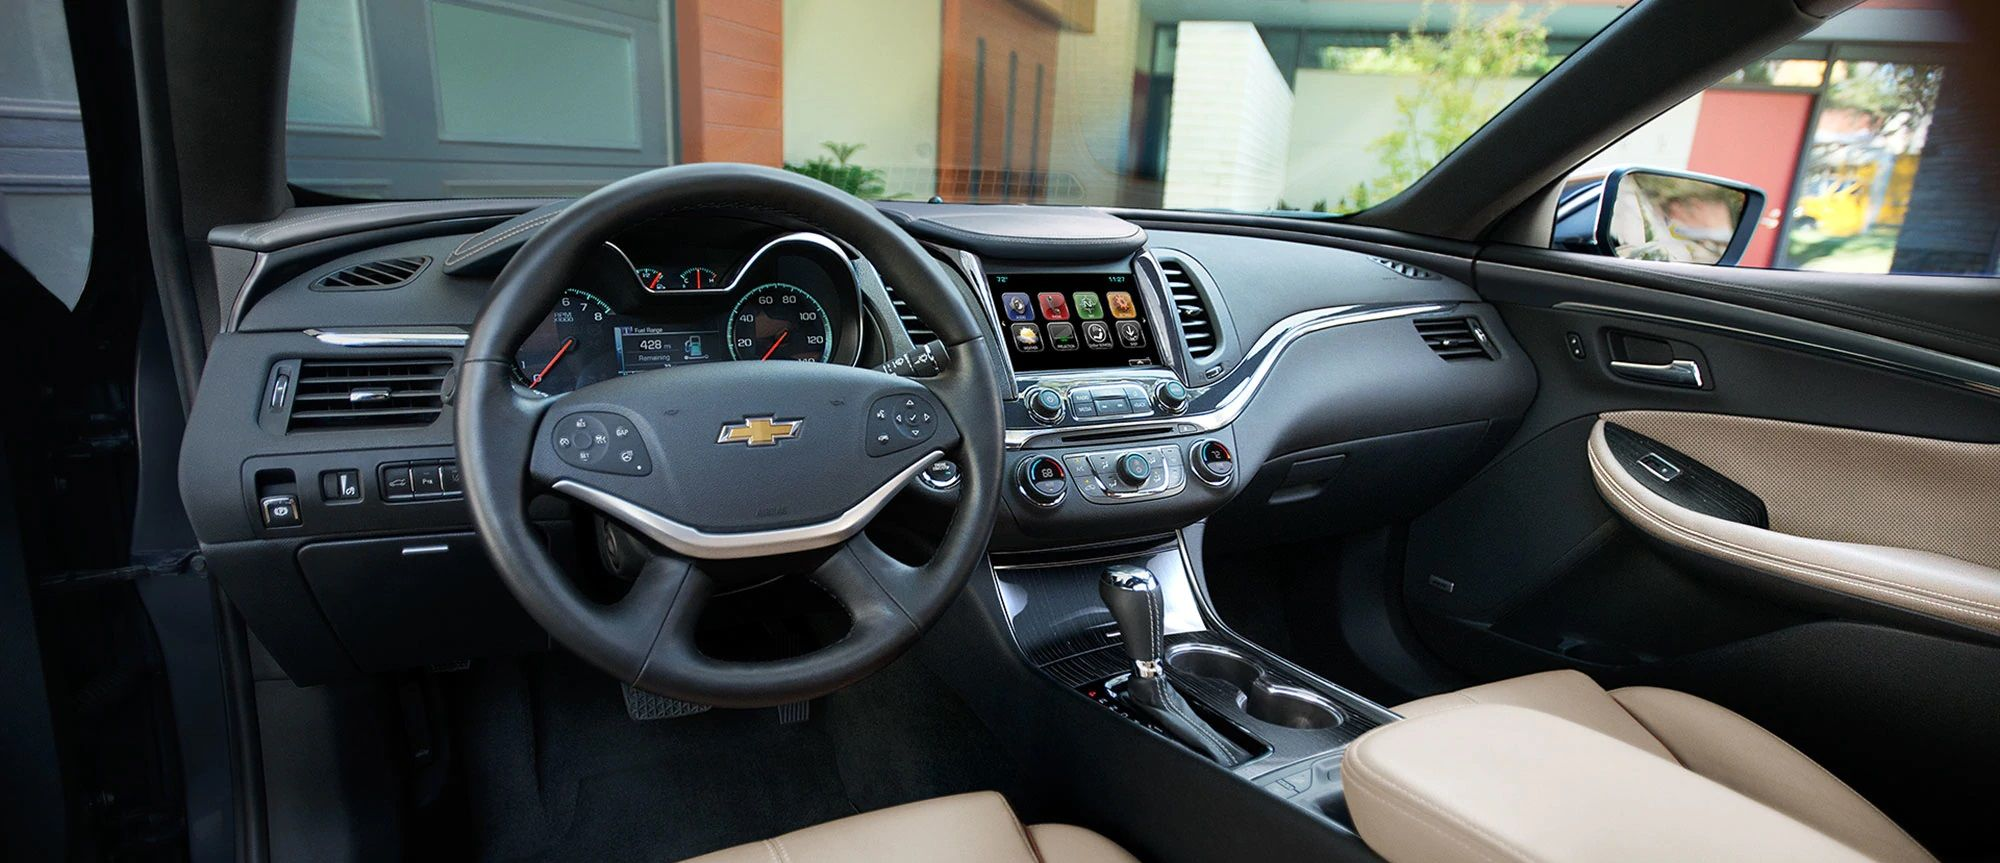 2019 Impala Cockpit